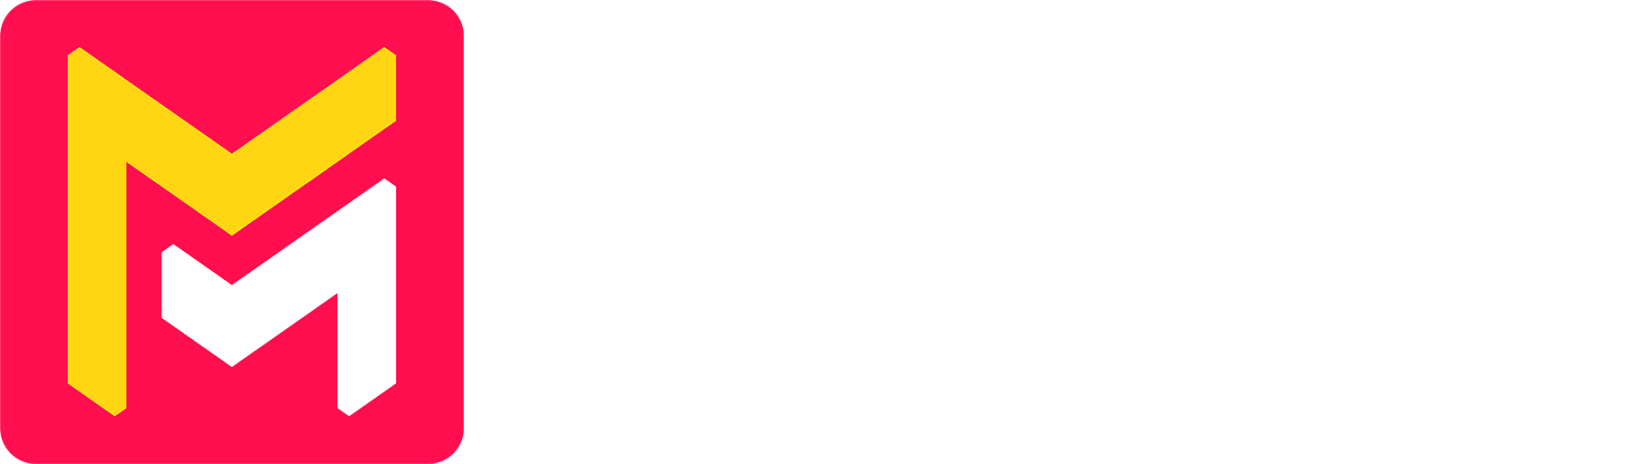 Maverick Render